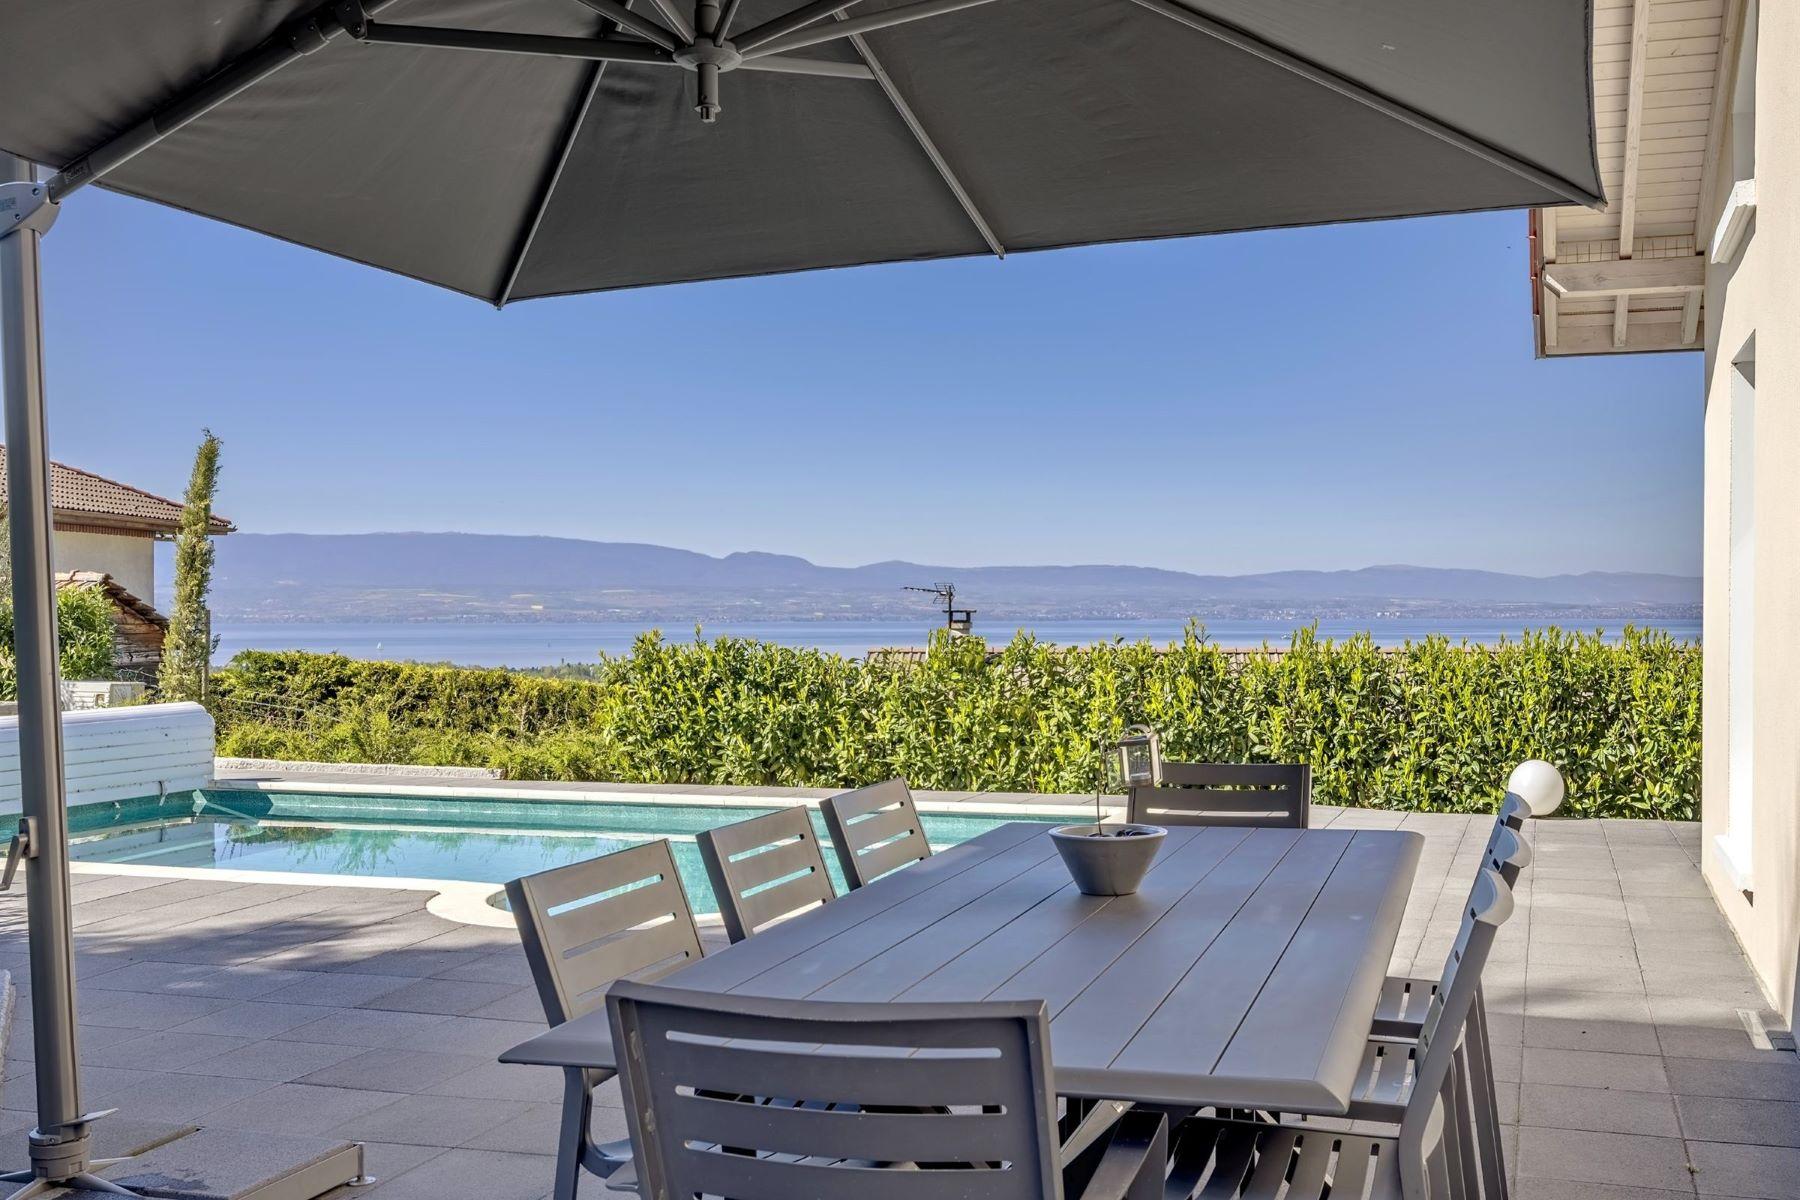 独户住宅 为 销售 在 Evian DOUBLE house view on the lake Publier, Rhone-Alpes, 74500 法国